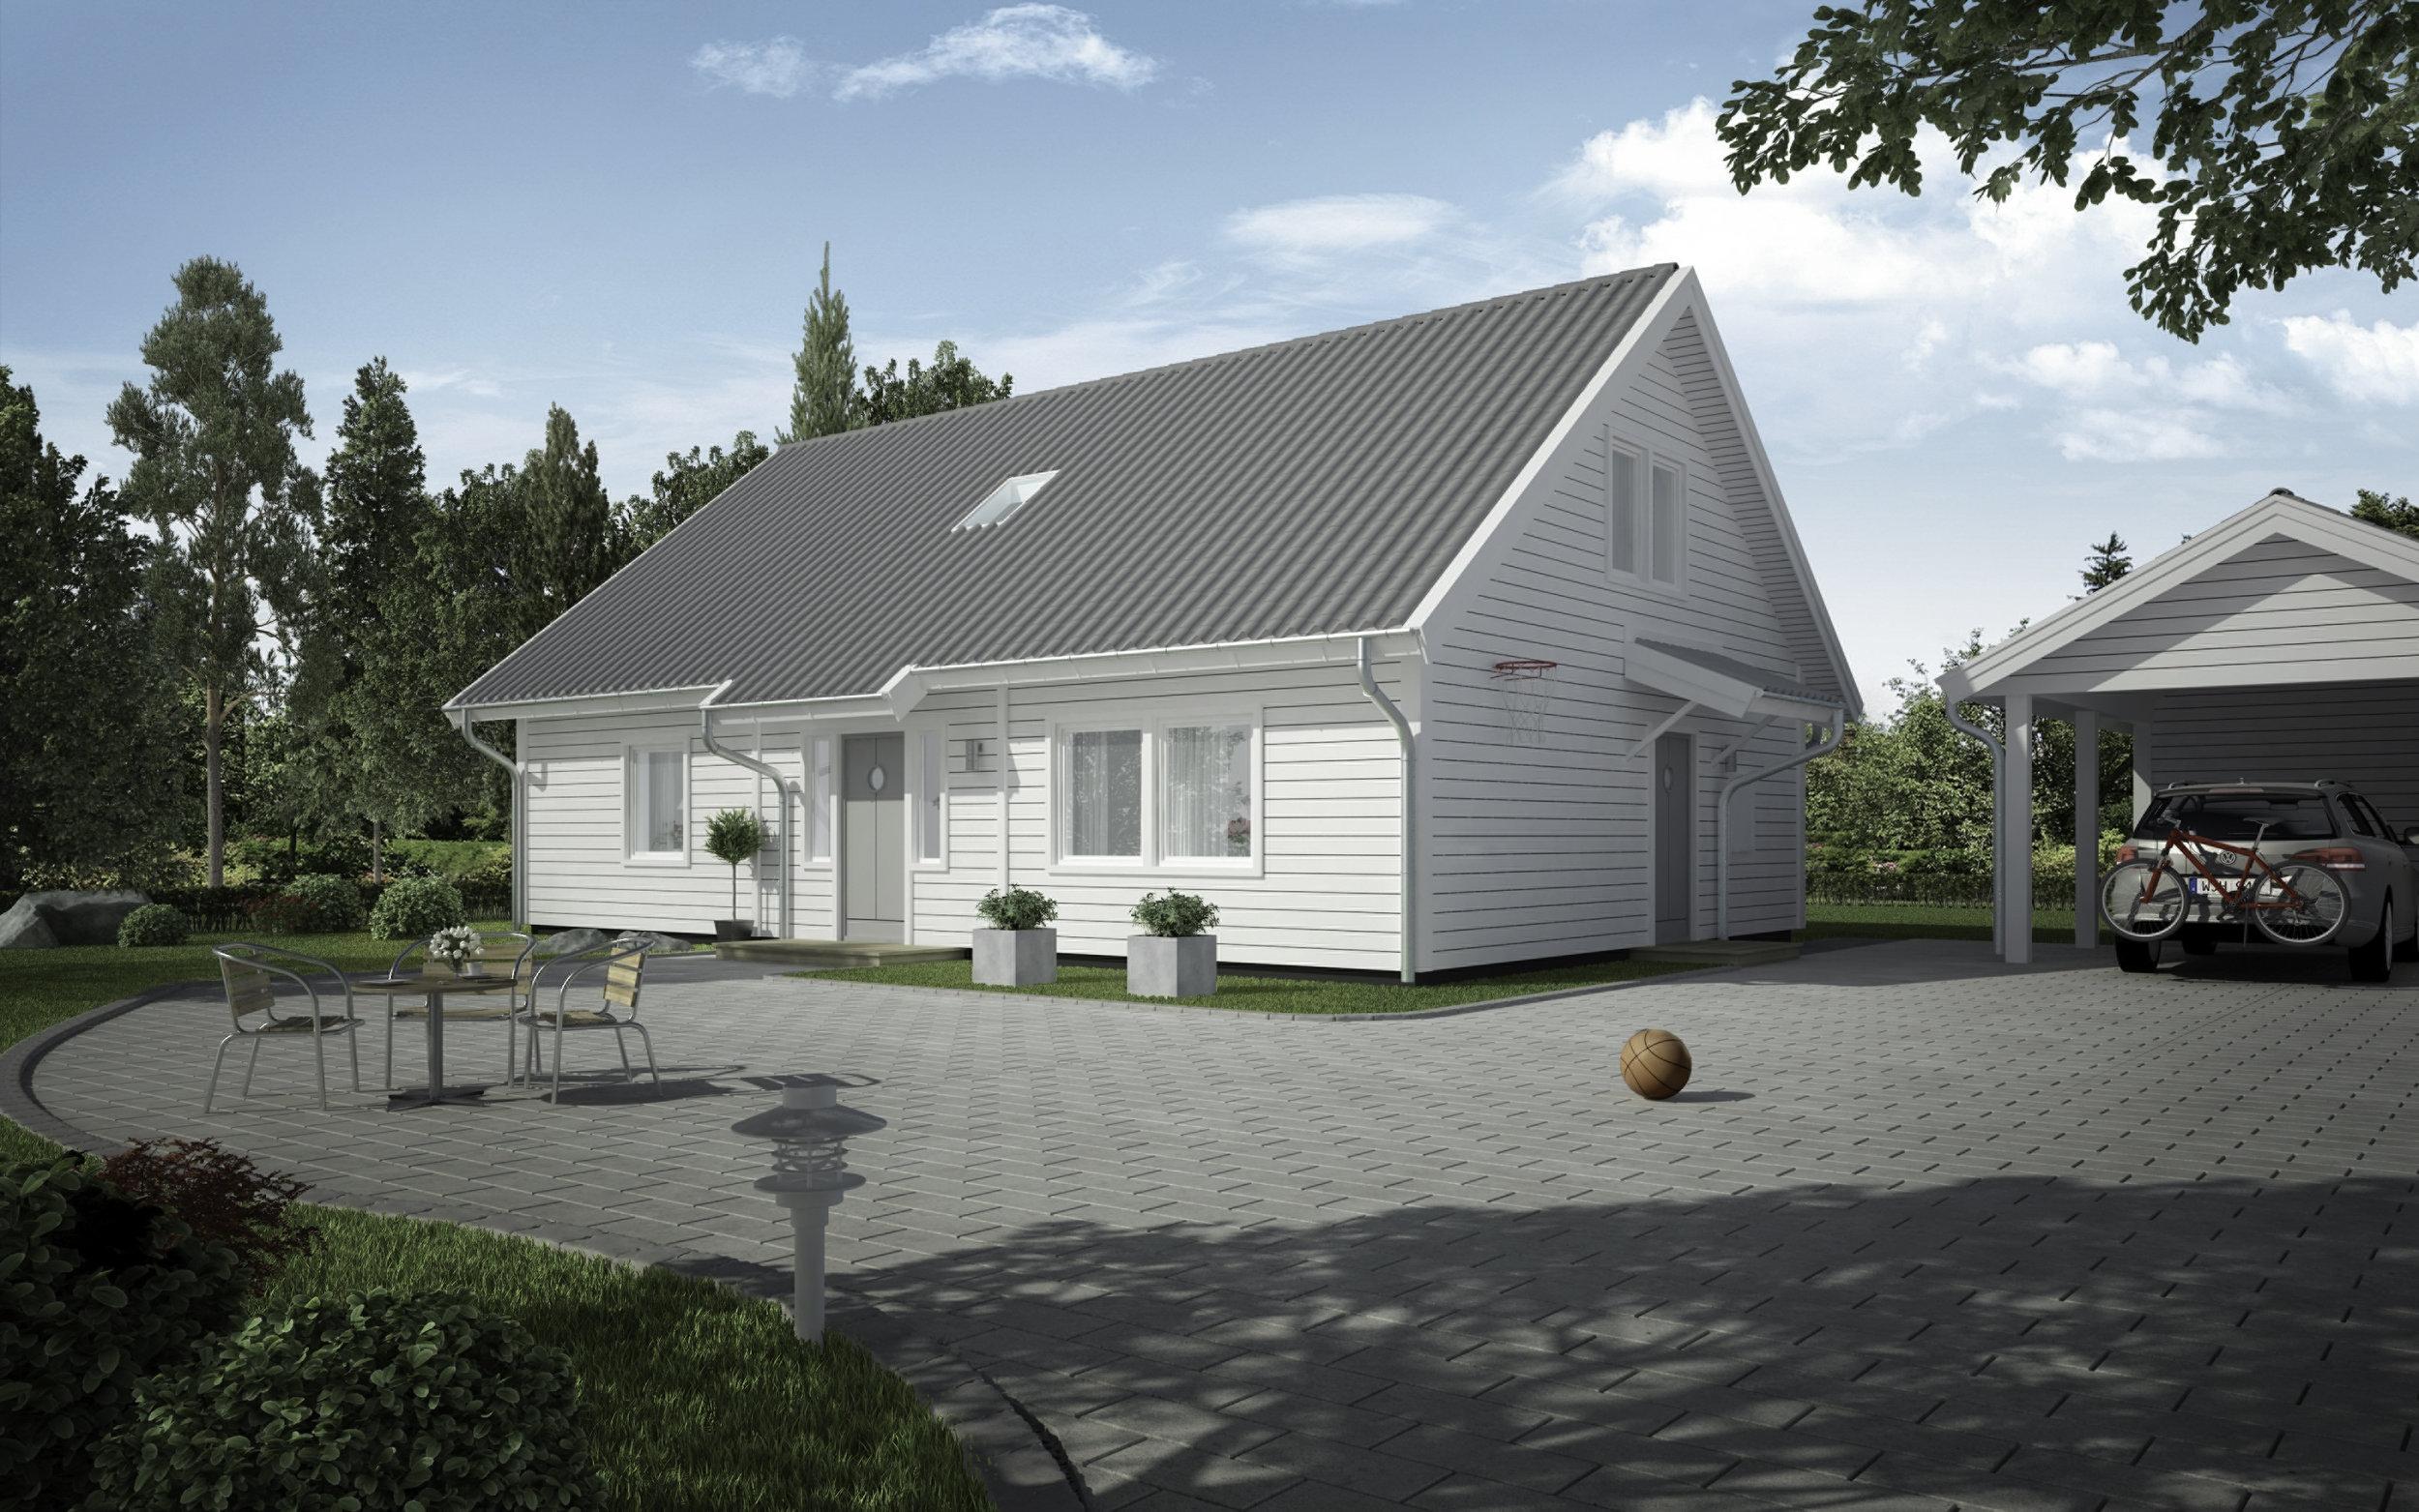 VILLA NYGÅRD  1,5-planshus Boyta: 148,8 m2 5 sovrum